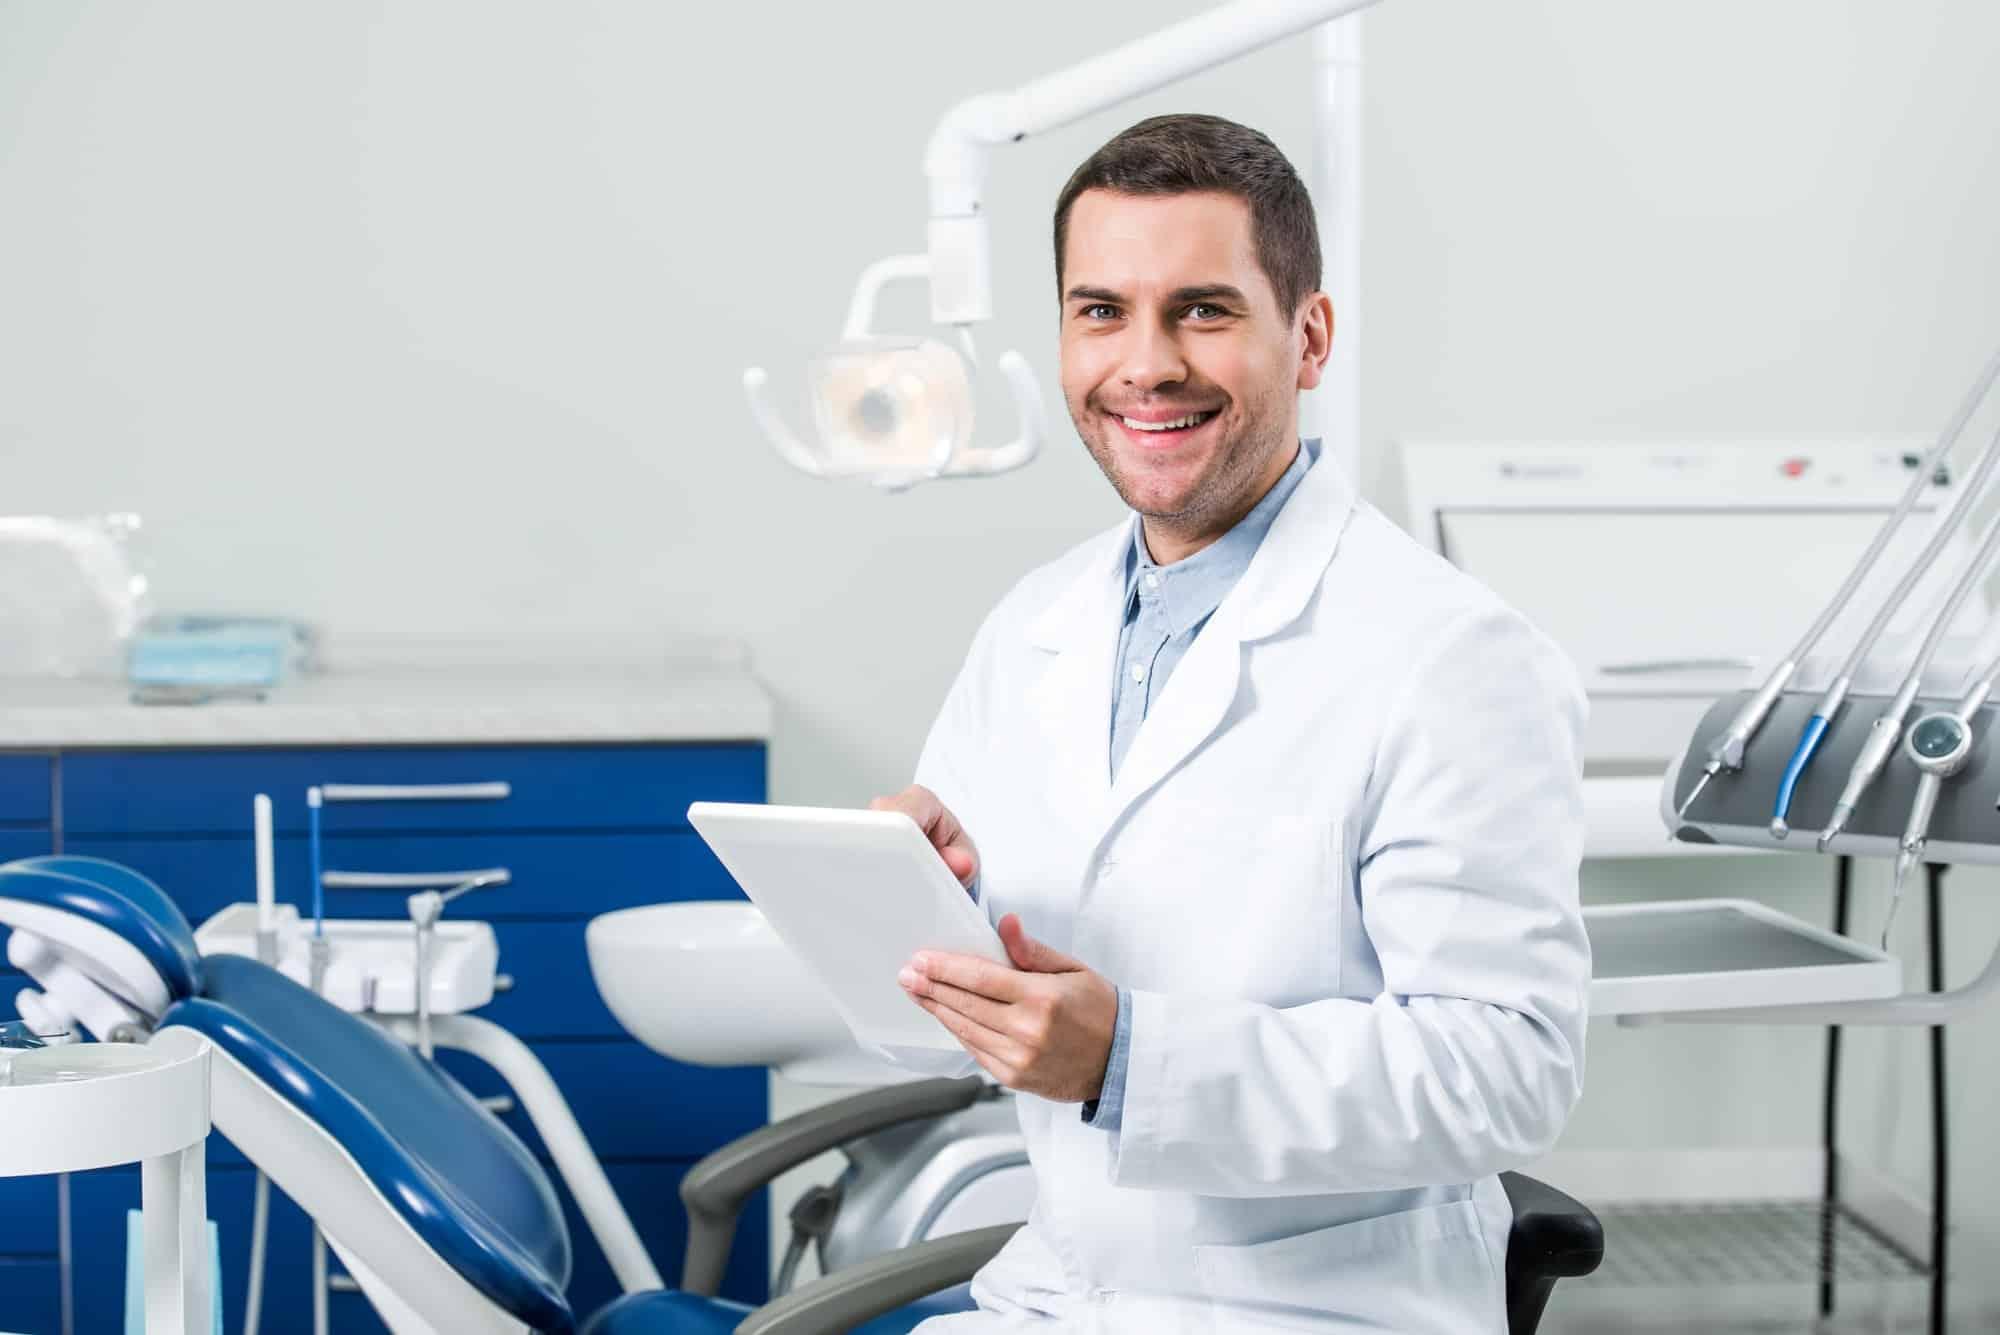 happy dentist in white coat holding digital tablet in dental clinic